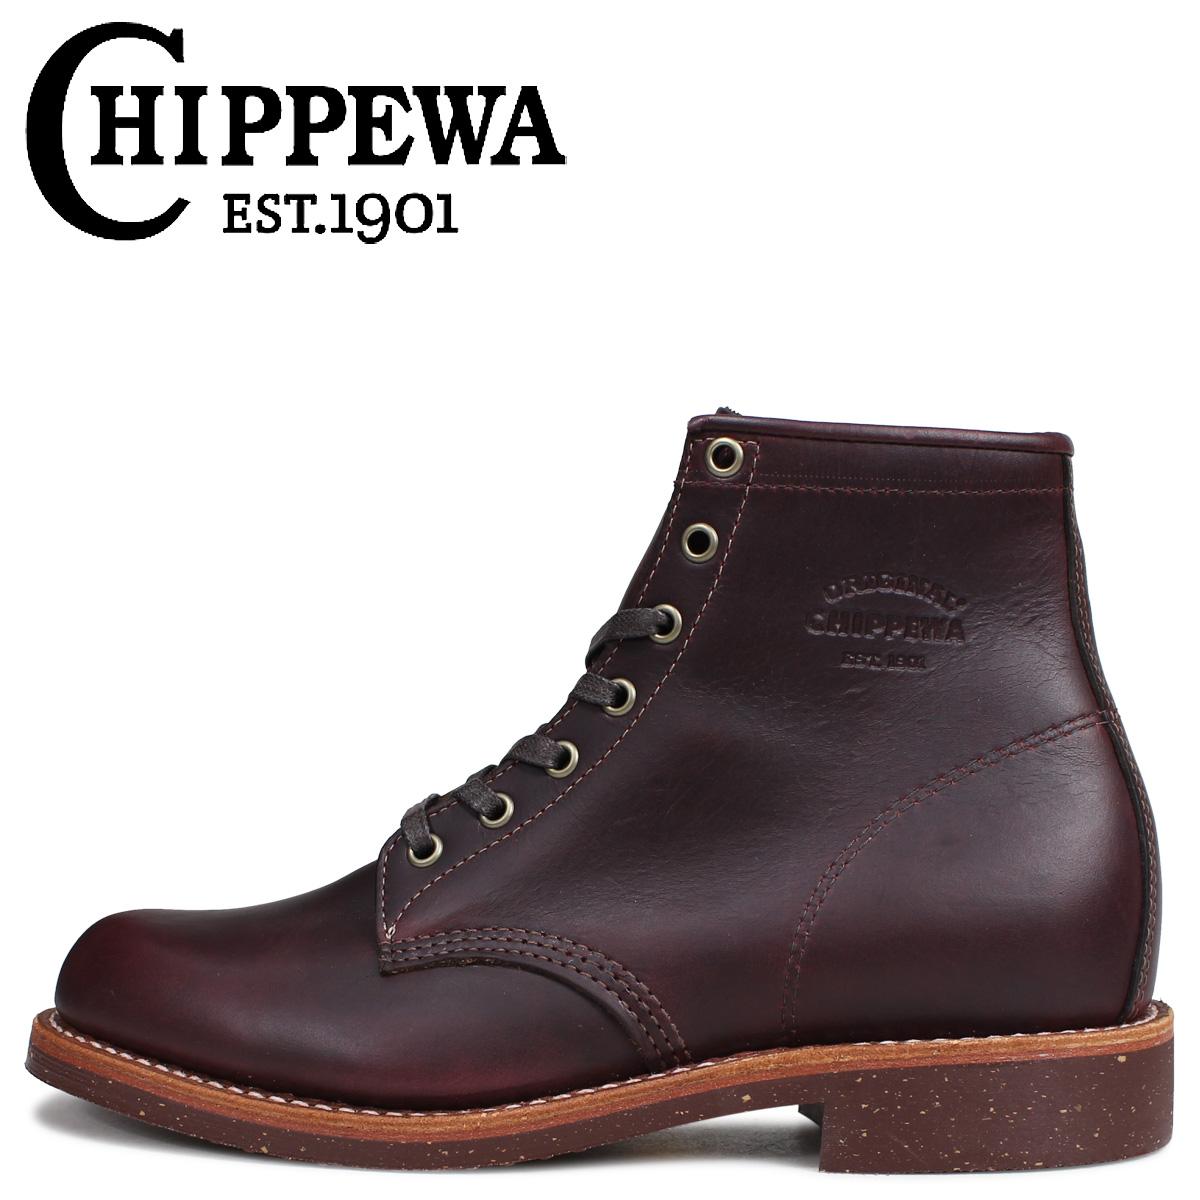 CHIPPEWA ブーツ 6インチ サービス チペワ 6INCH SERVICE BOOT 1901M25 Dワイズ コードバン メンズ [3/30 追加入荷]